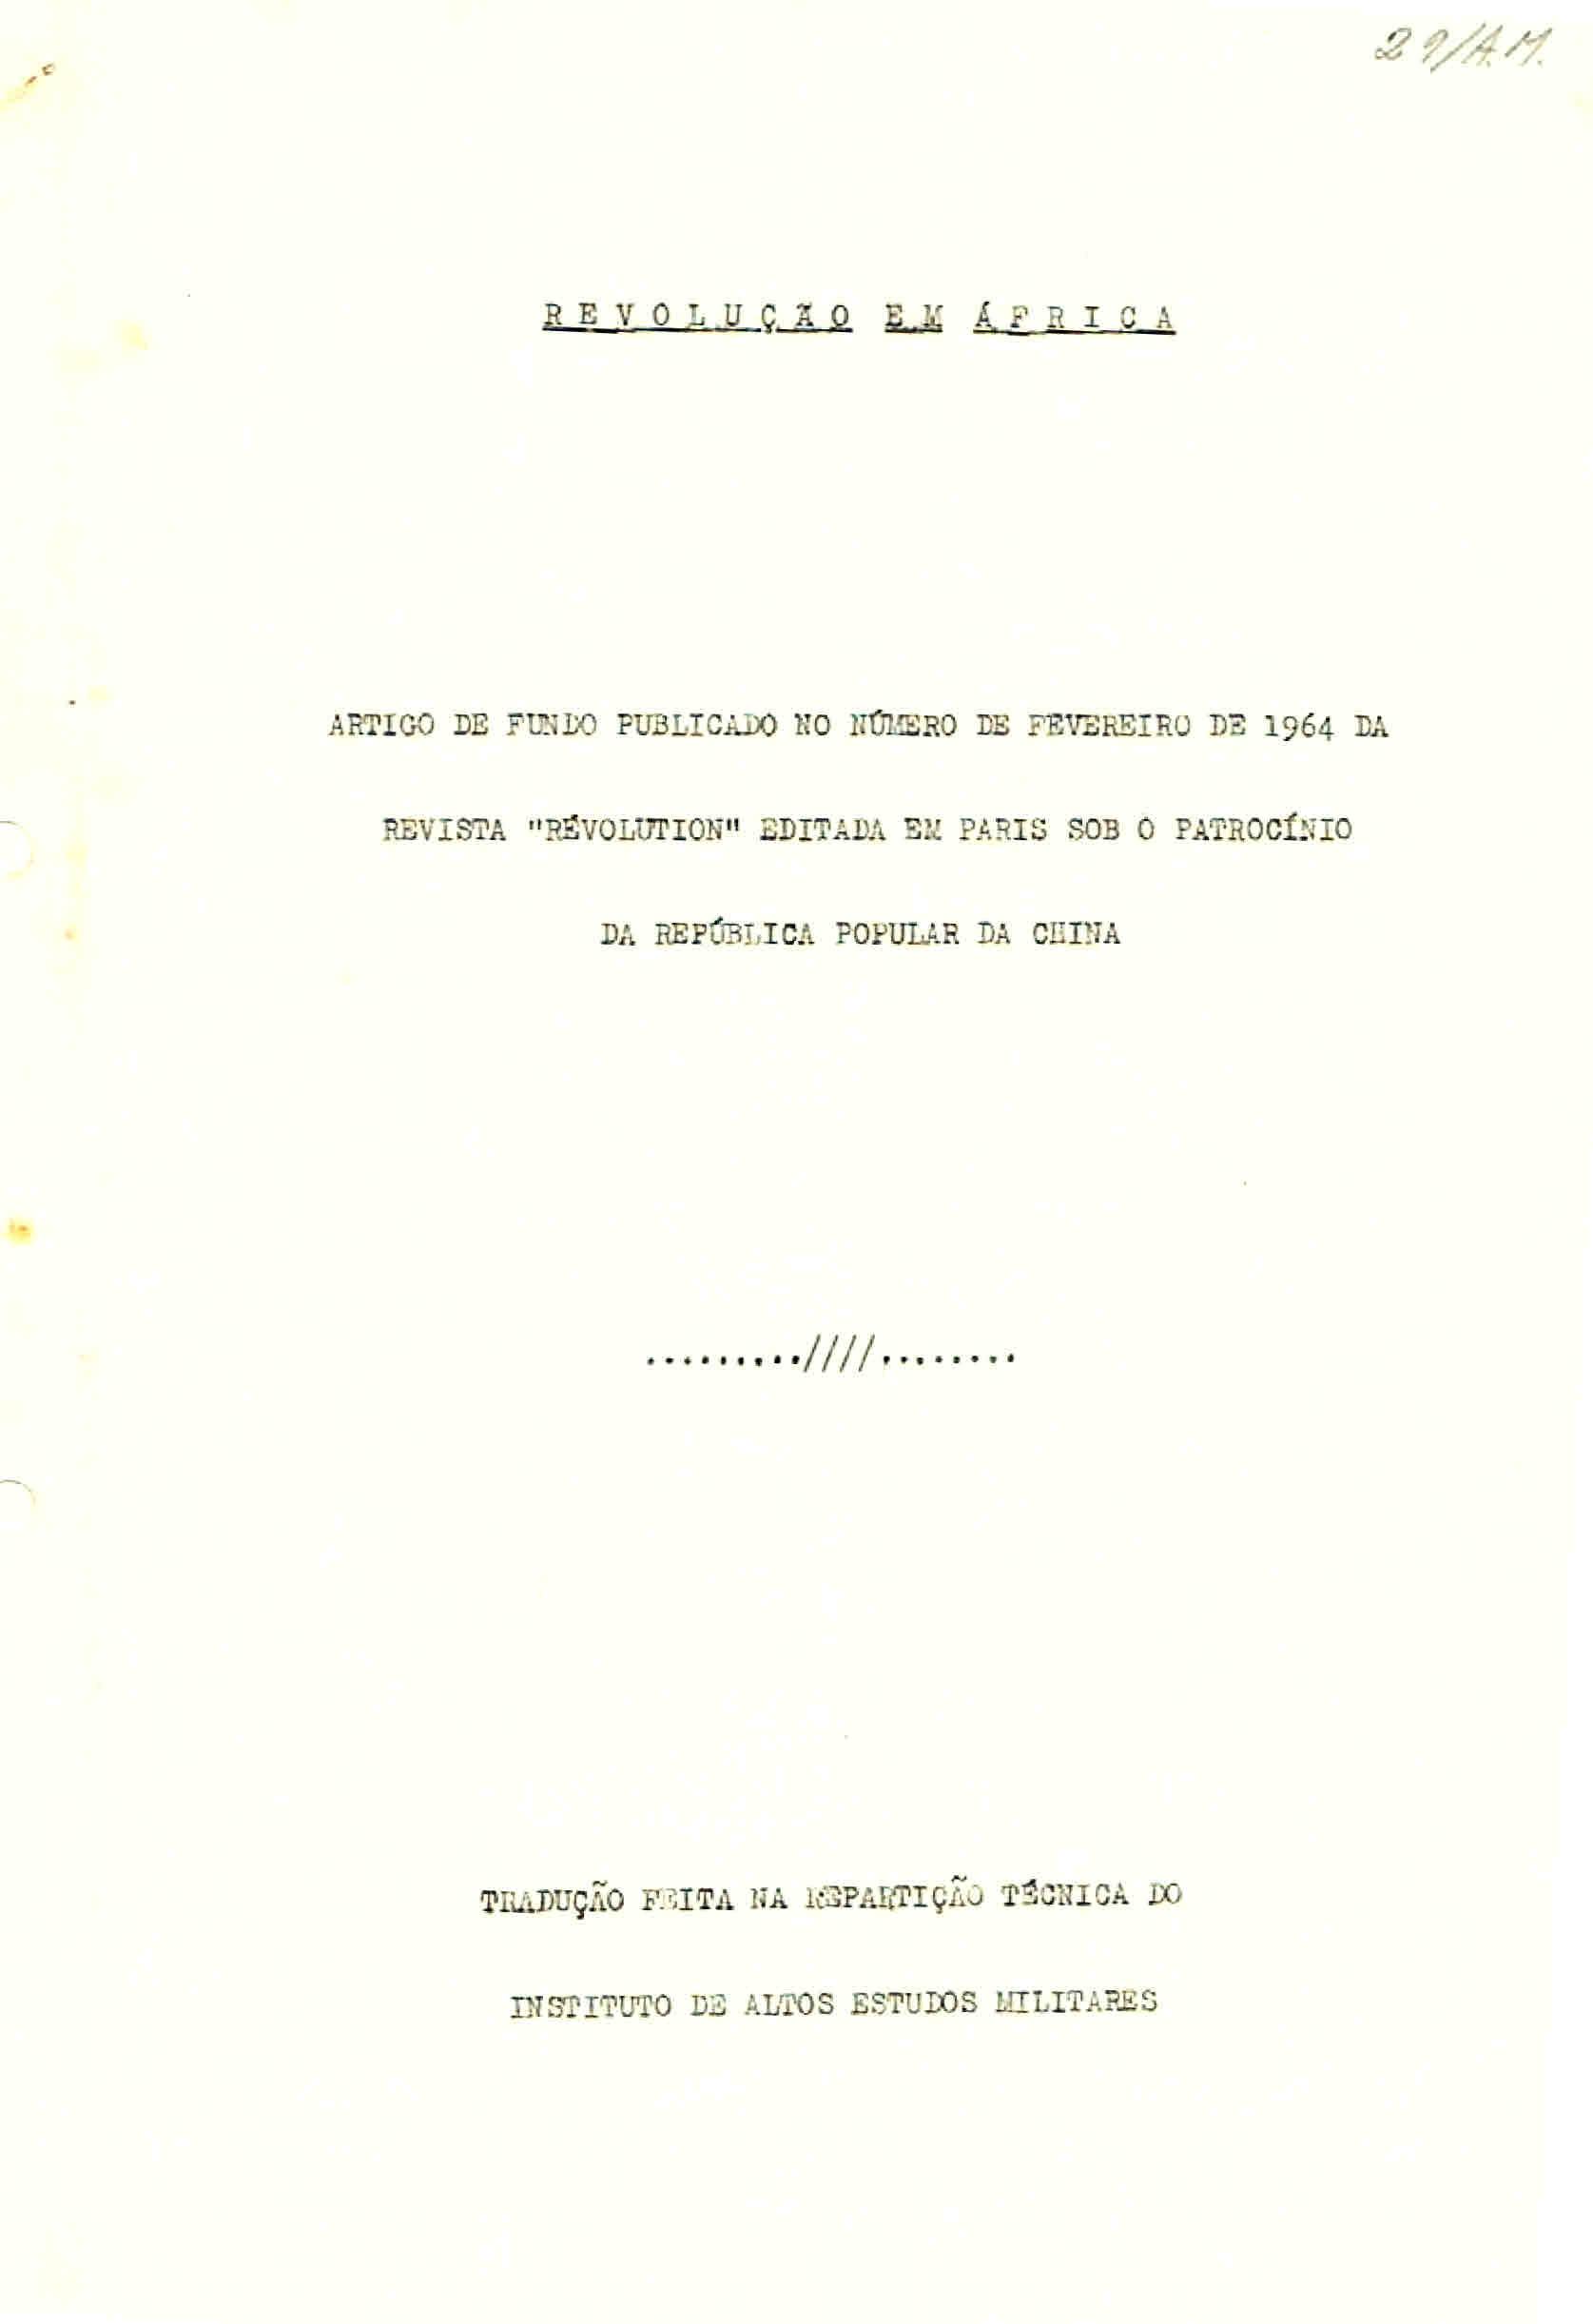 Copy of REV